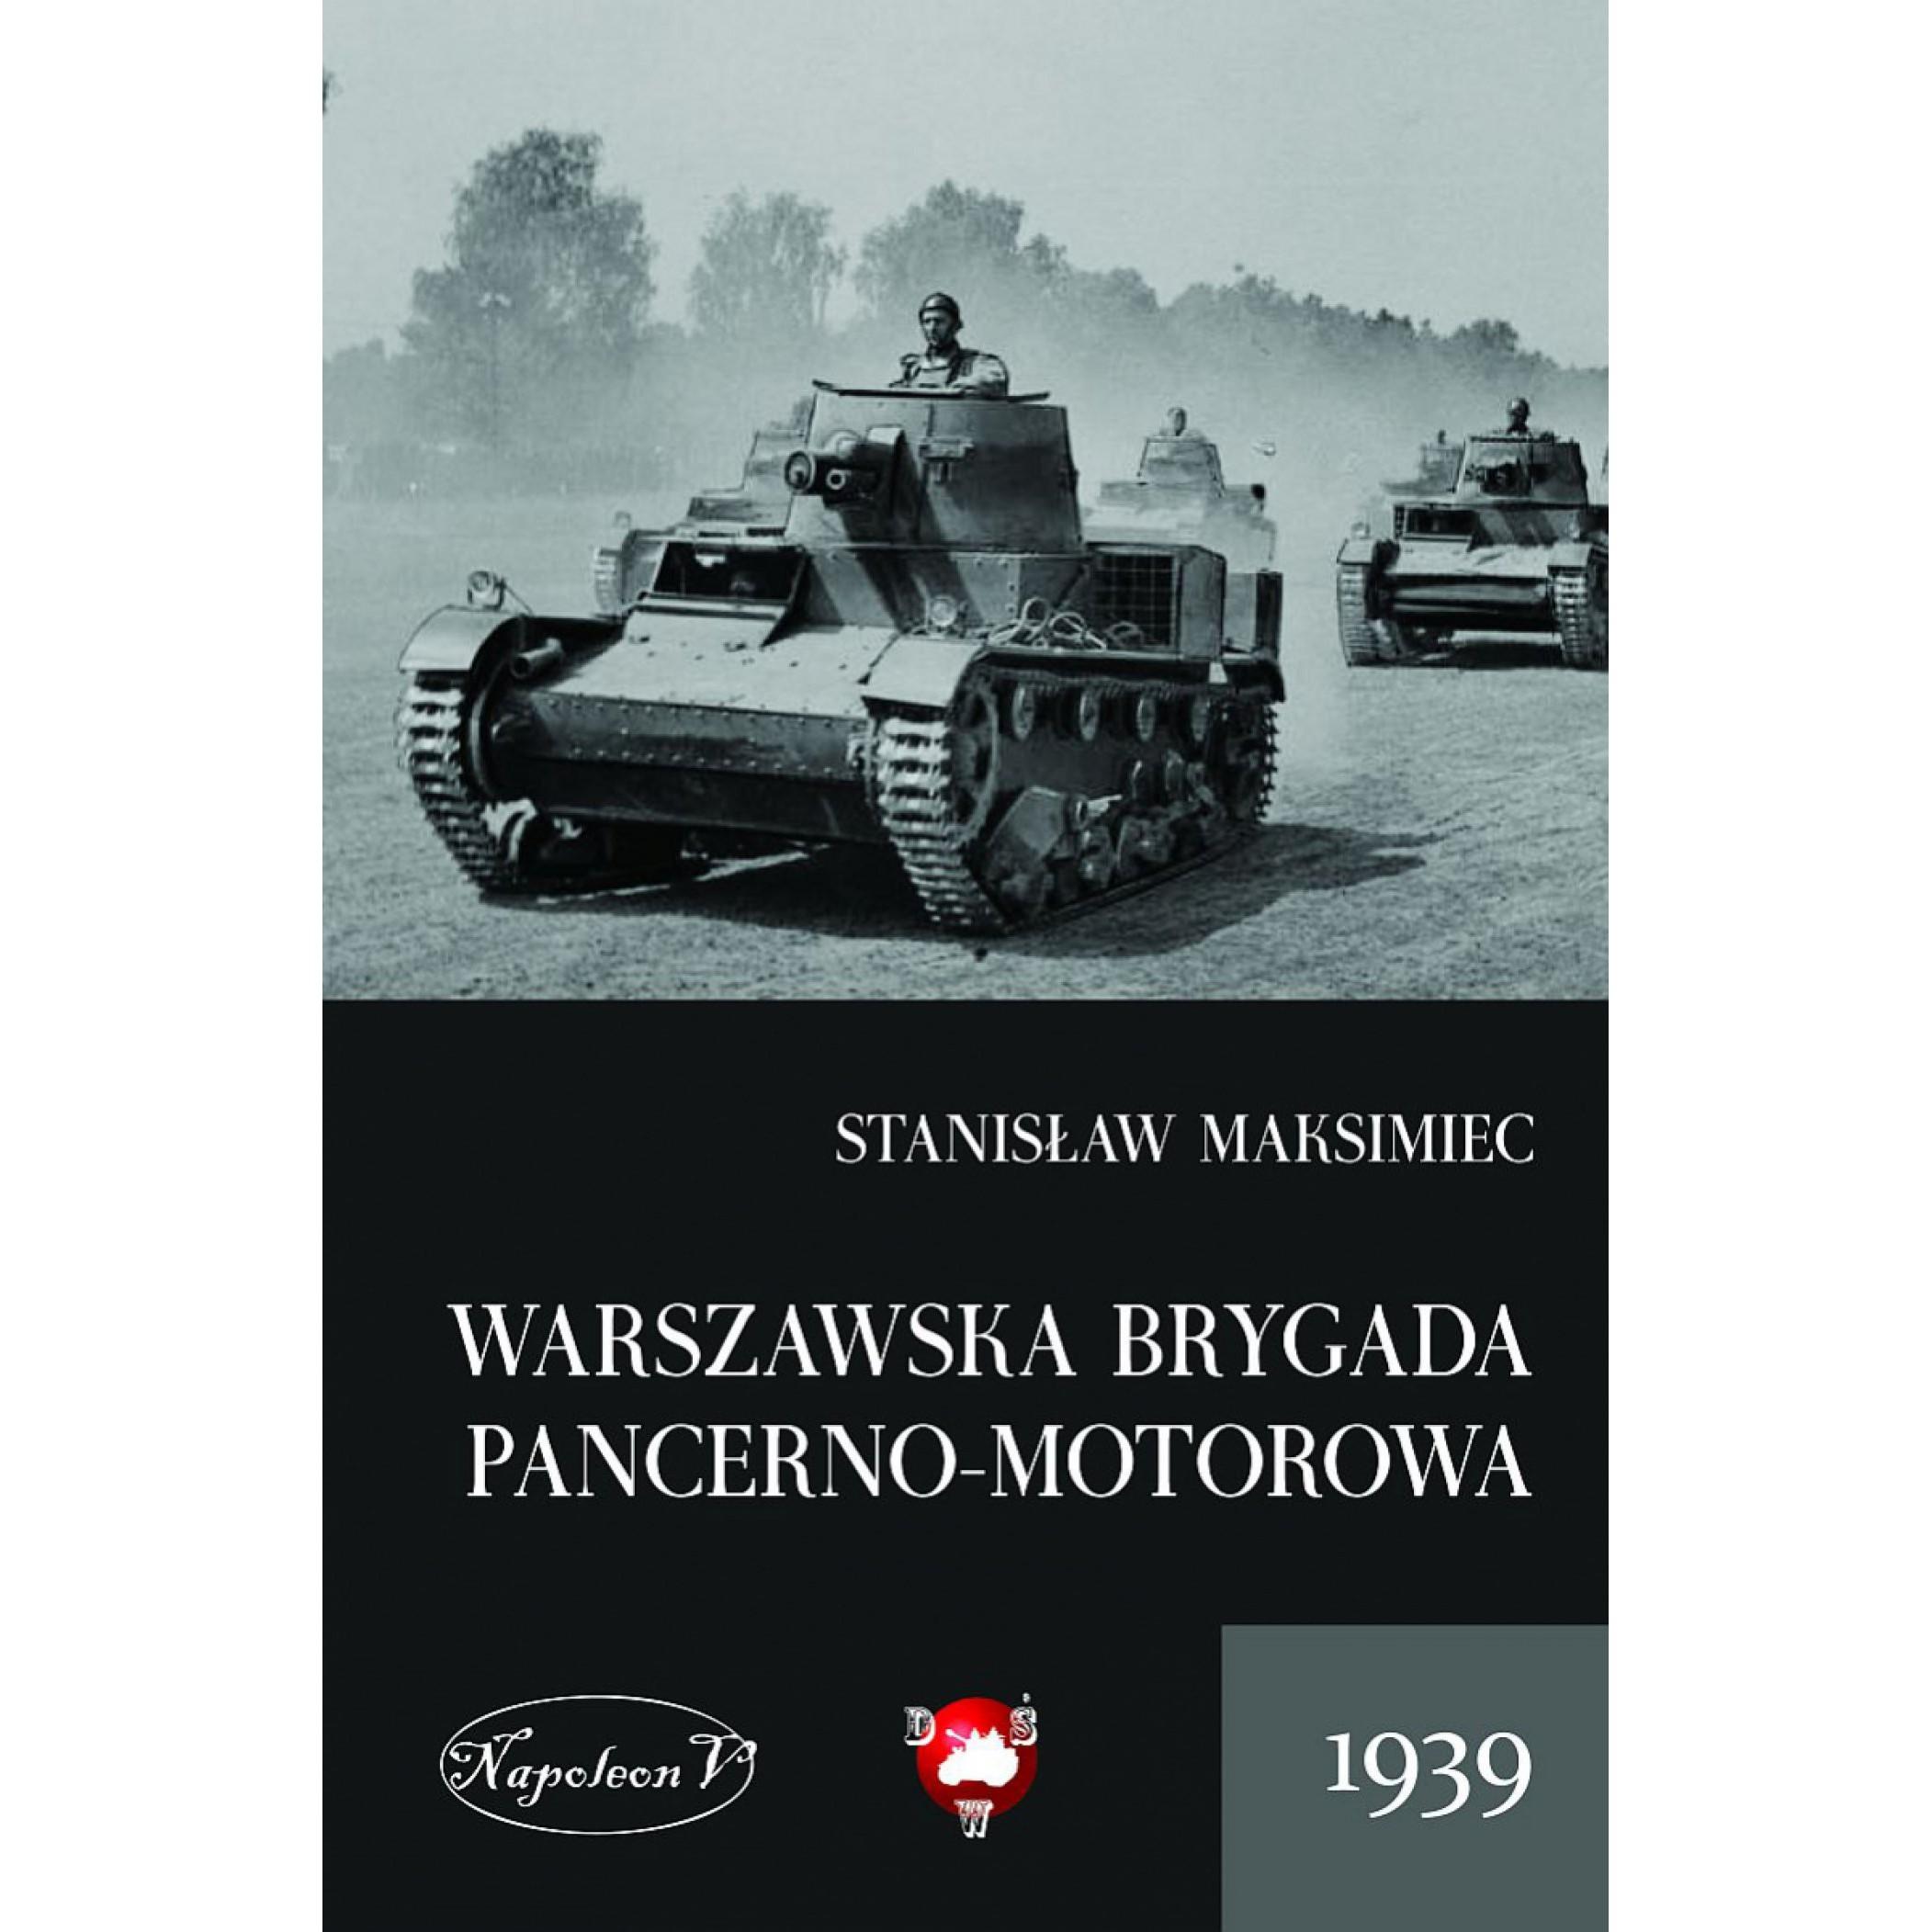 Warszawska Brygada Pancerno-Motorowa 1939